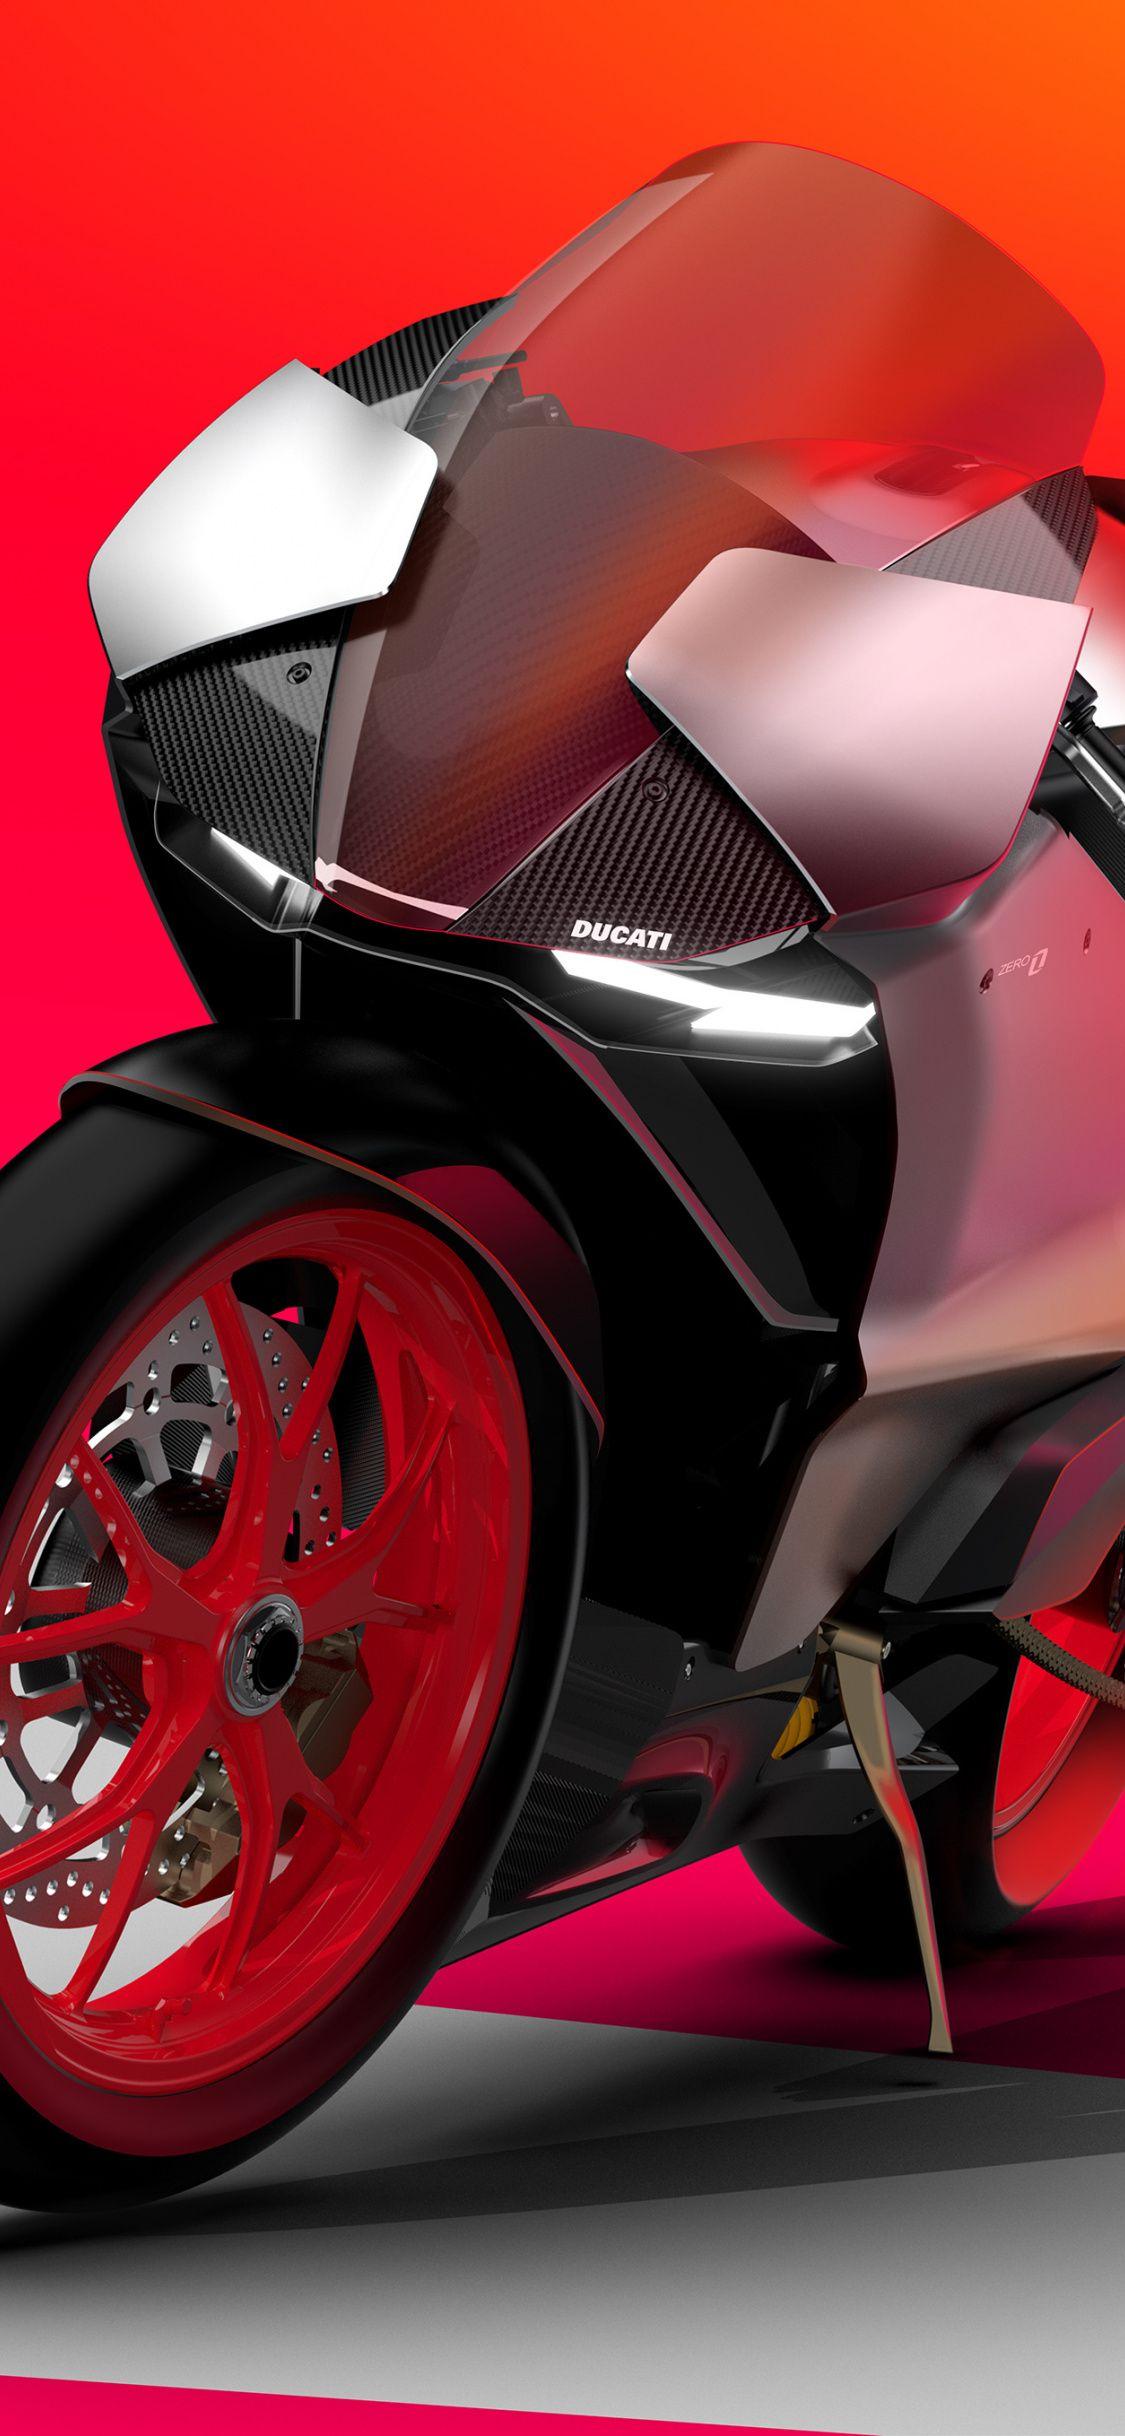 Ducati Zero Electric Superbike 2020 Sports Bike Art 1125x2436